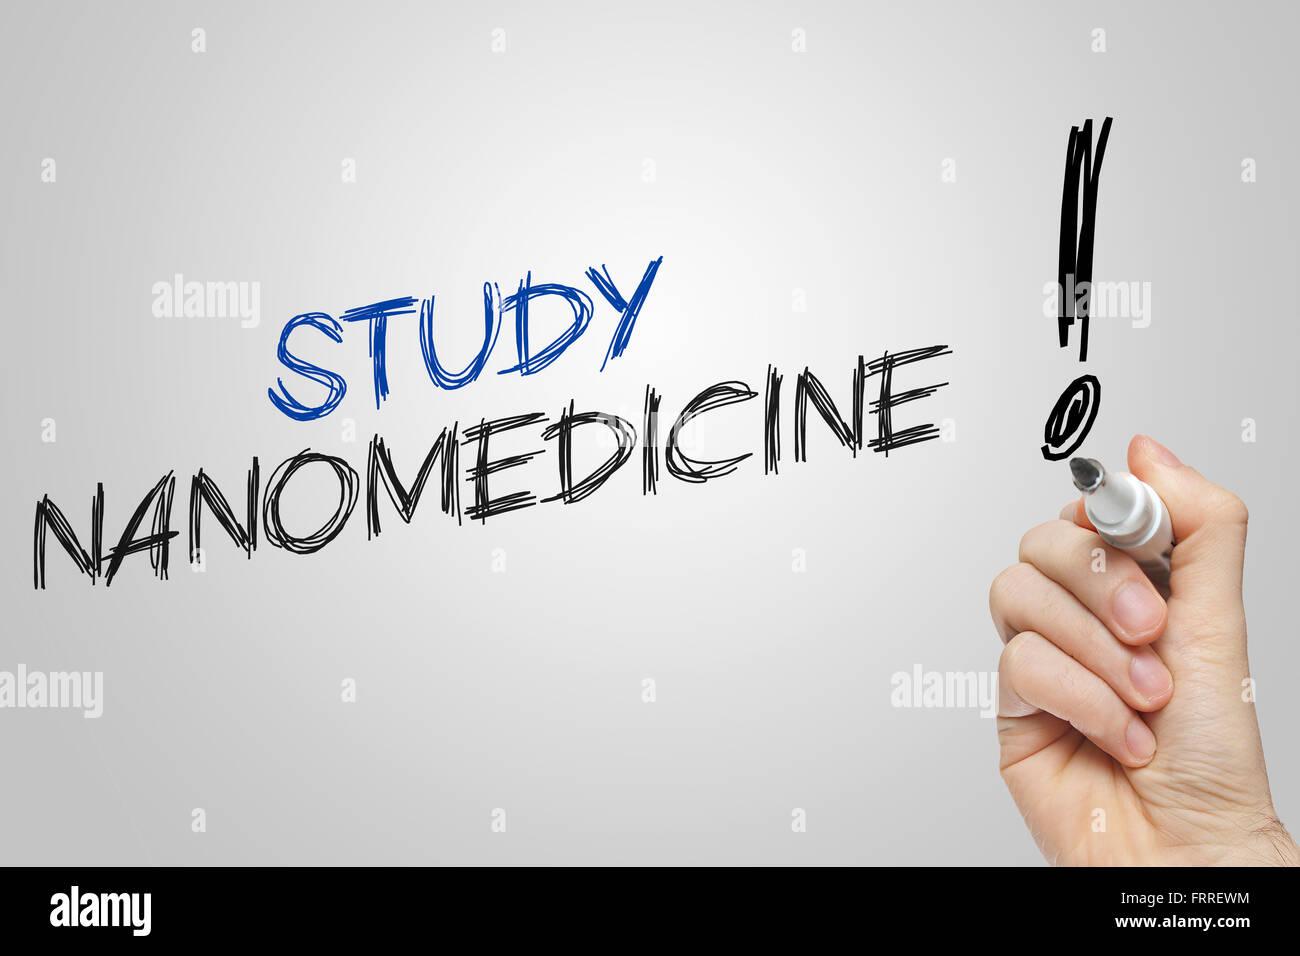 Hand writing study nanomedicine on grey background - Stock Image